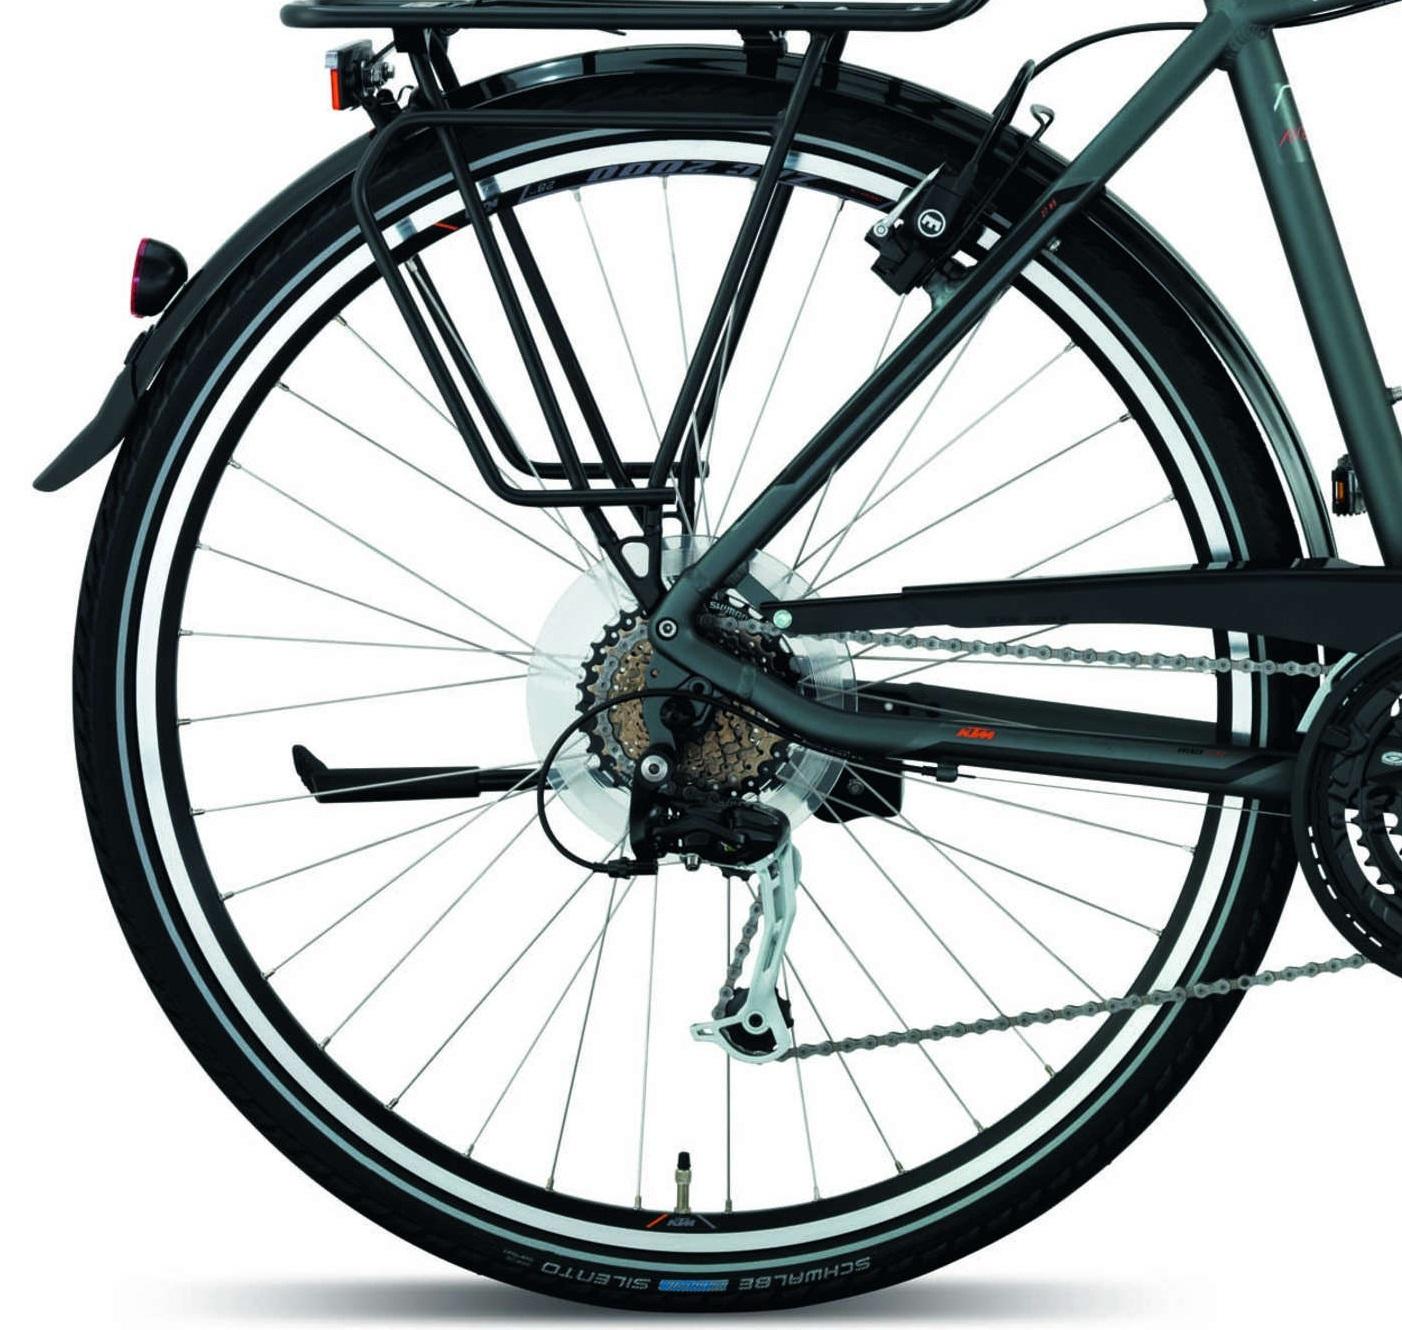 herren fahrrad ktm avenza 27 hs 2014 trekking shimano. Black Bedroom Furniture Sets. Home Design Ideas